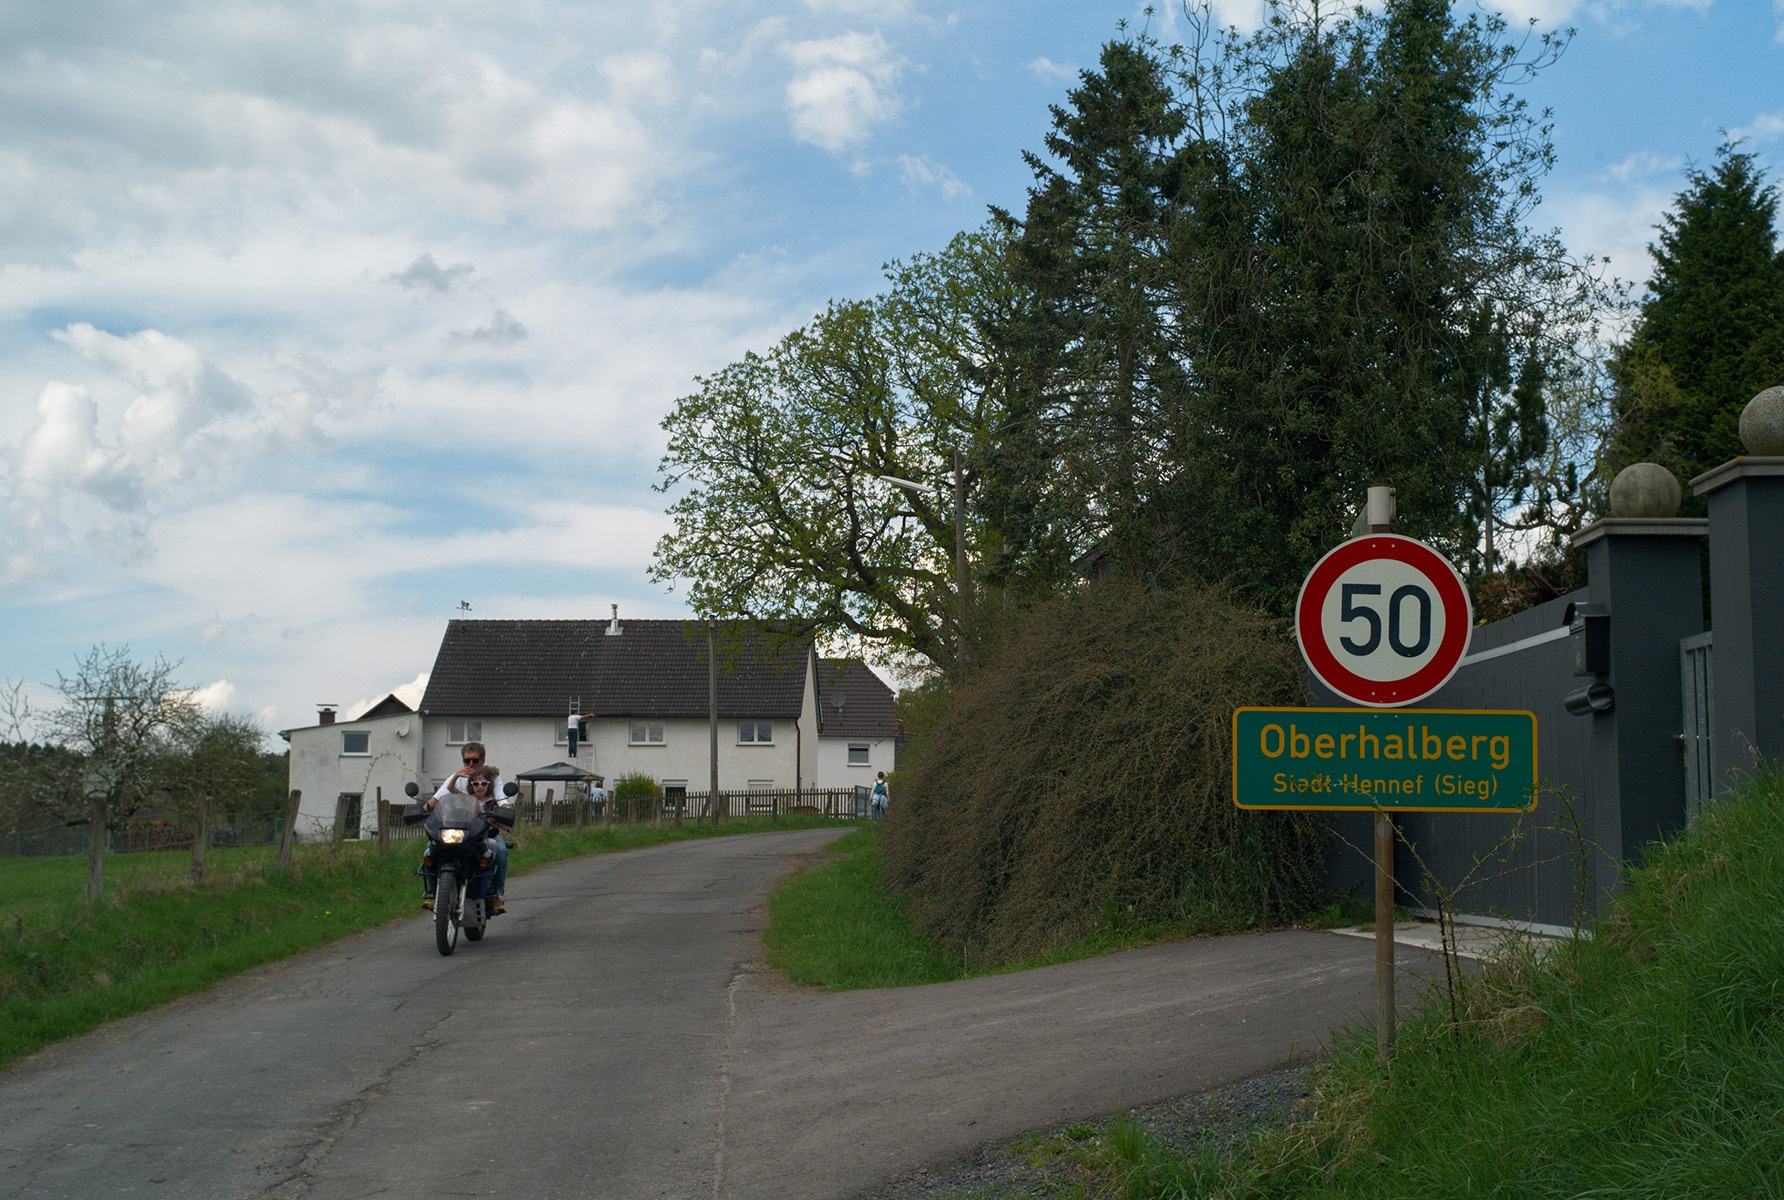 Welcome to Oberhalberg by Funktrainer